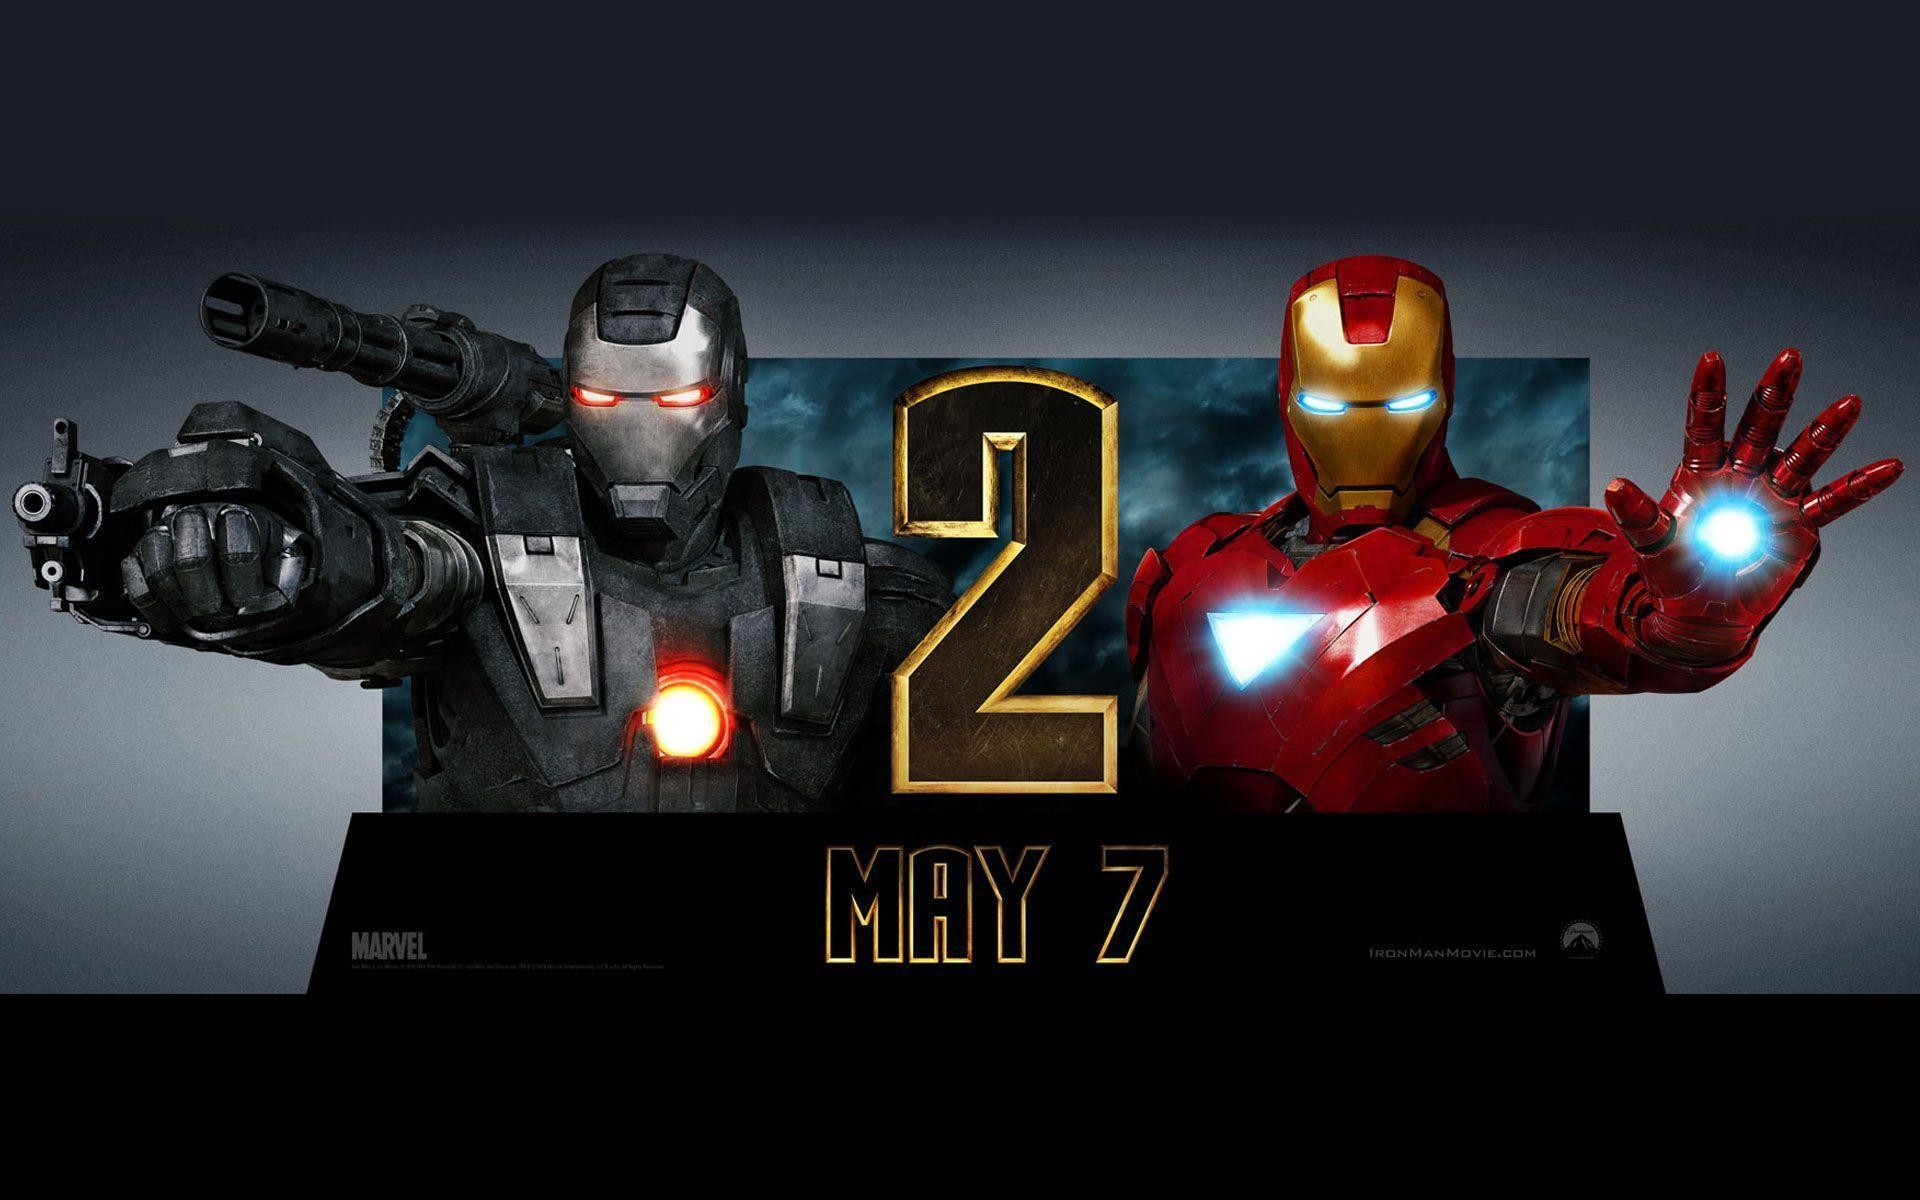 War Machine Iron Man 2 wallpaper – 228462